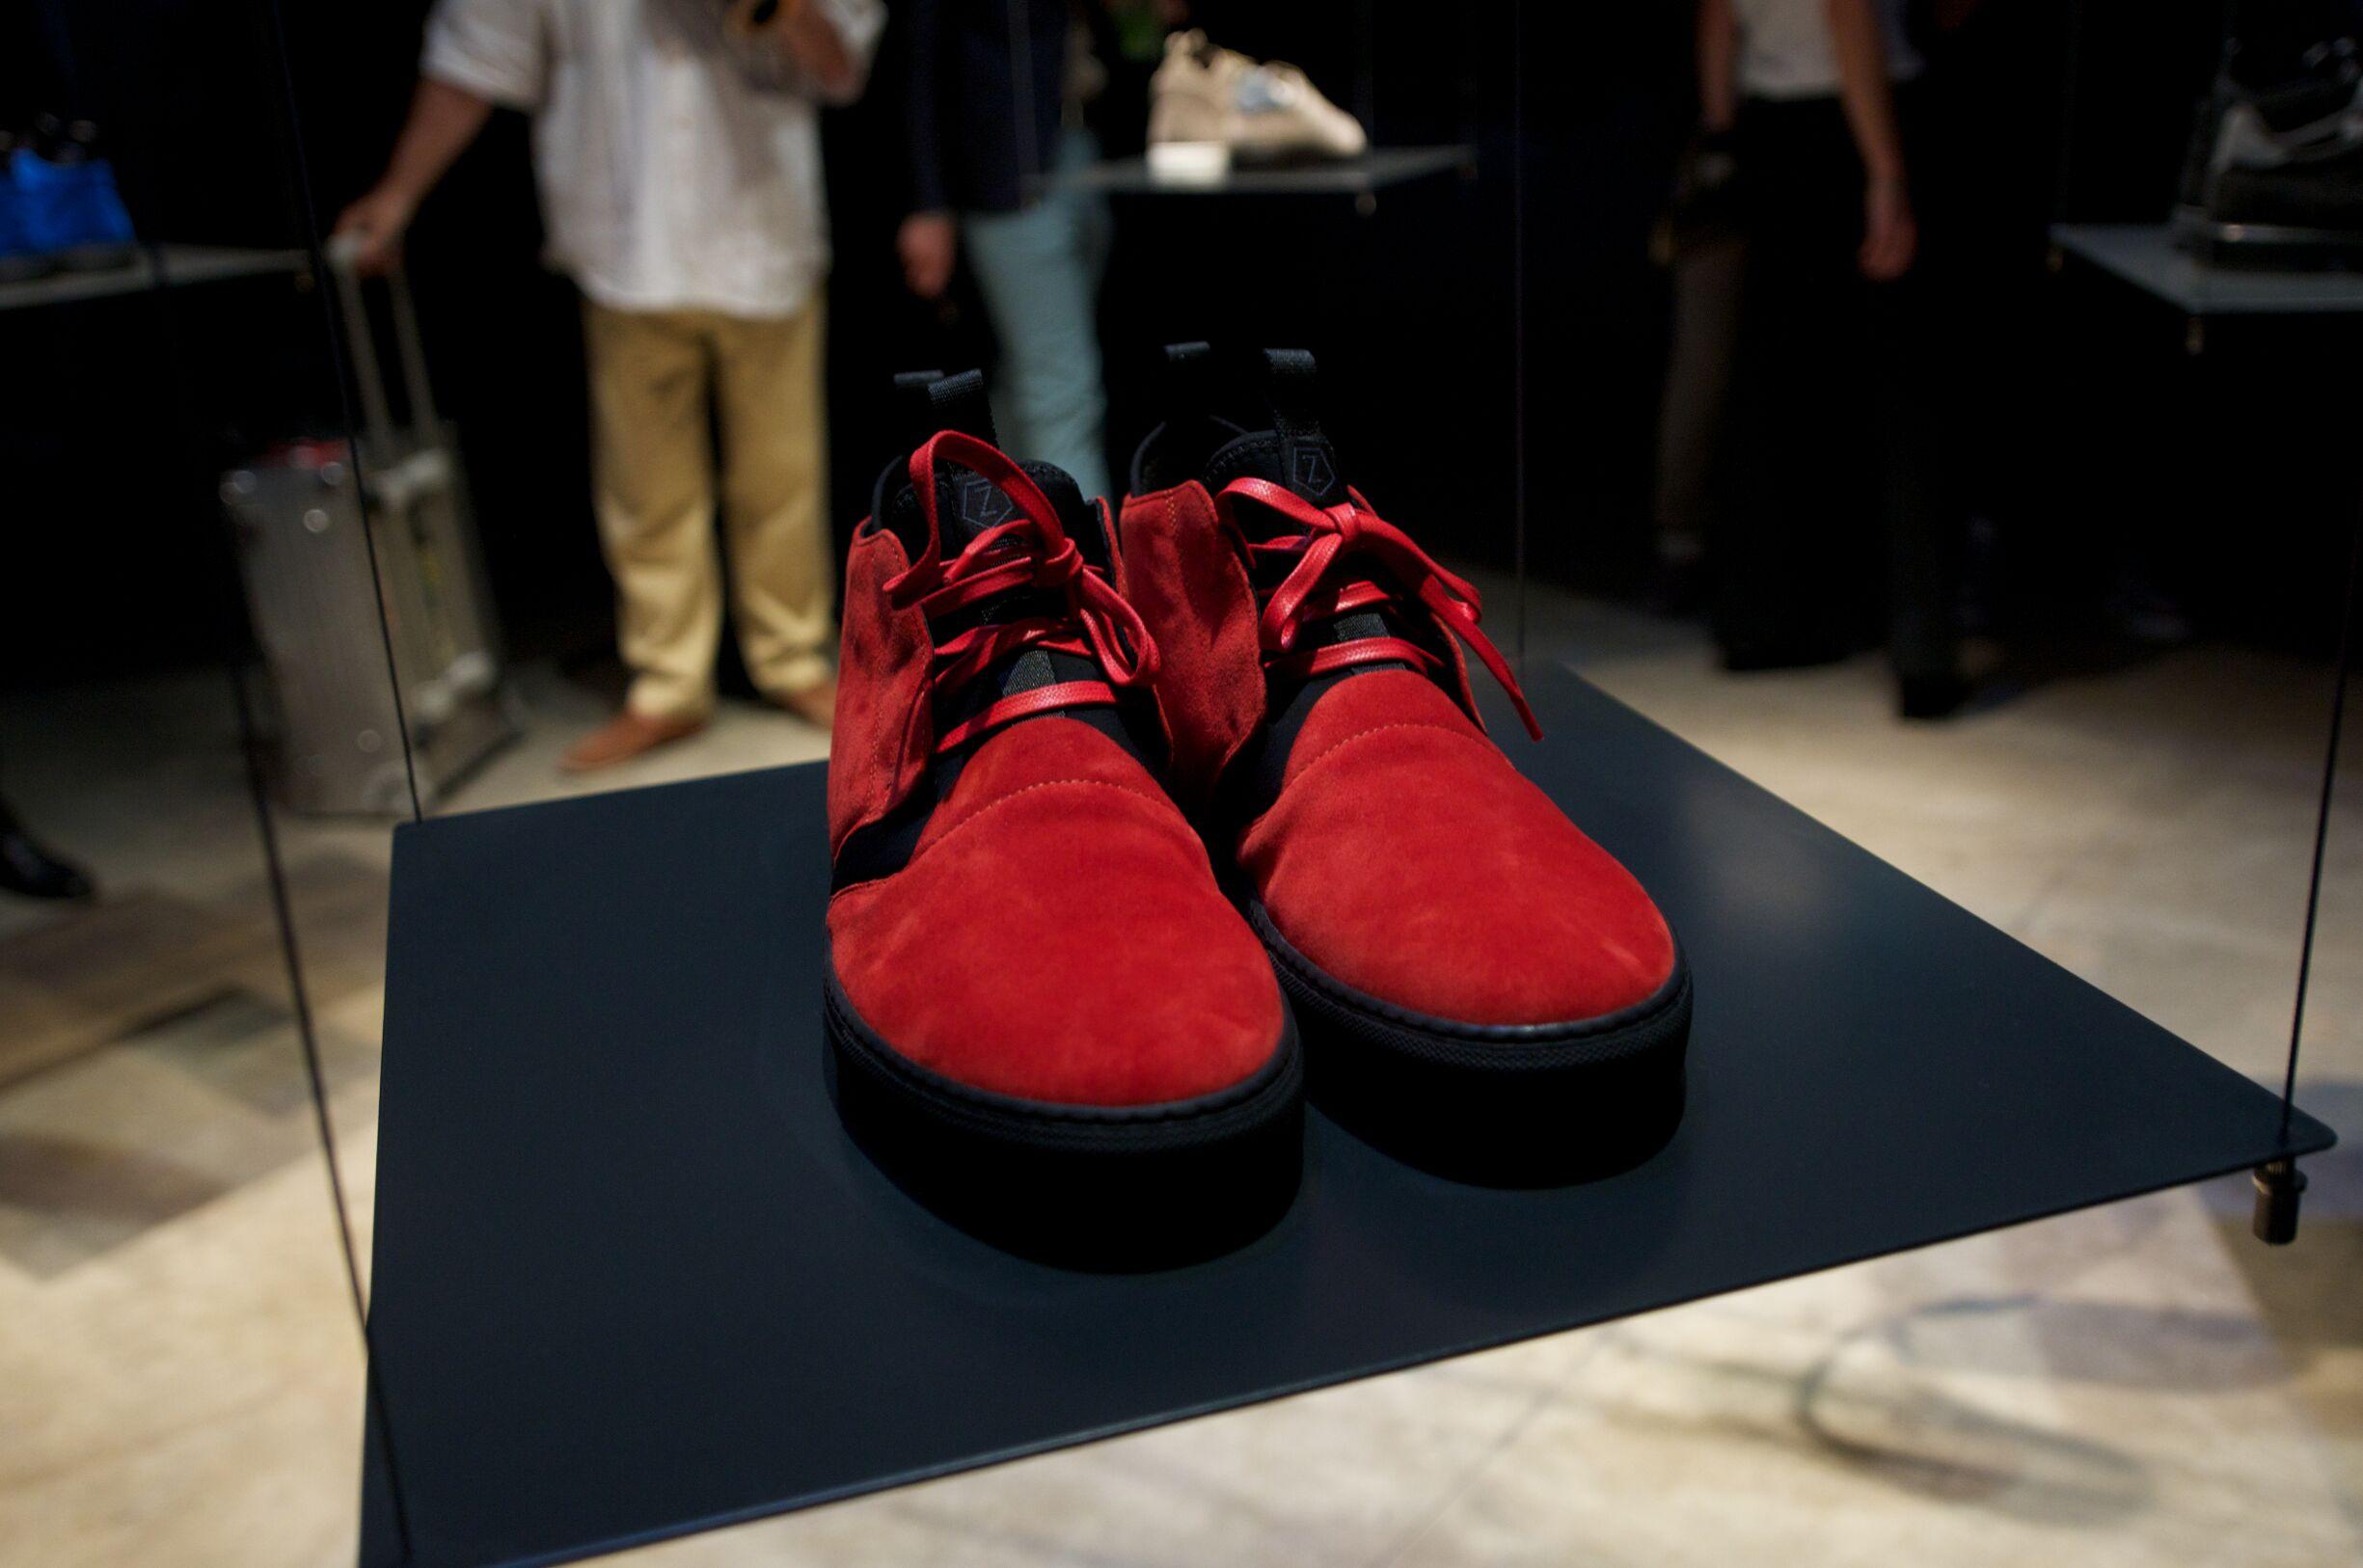 Z Zegna Shoes Detail